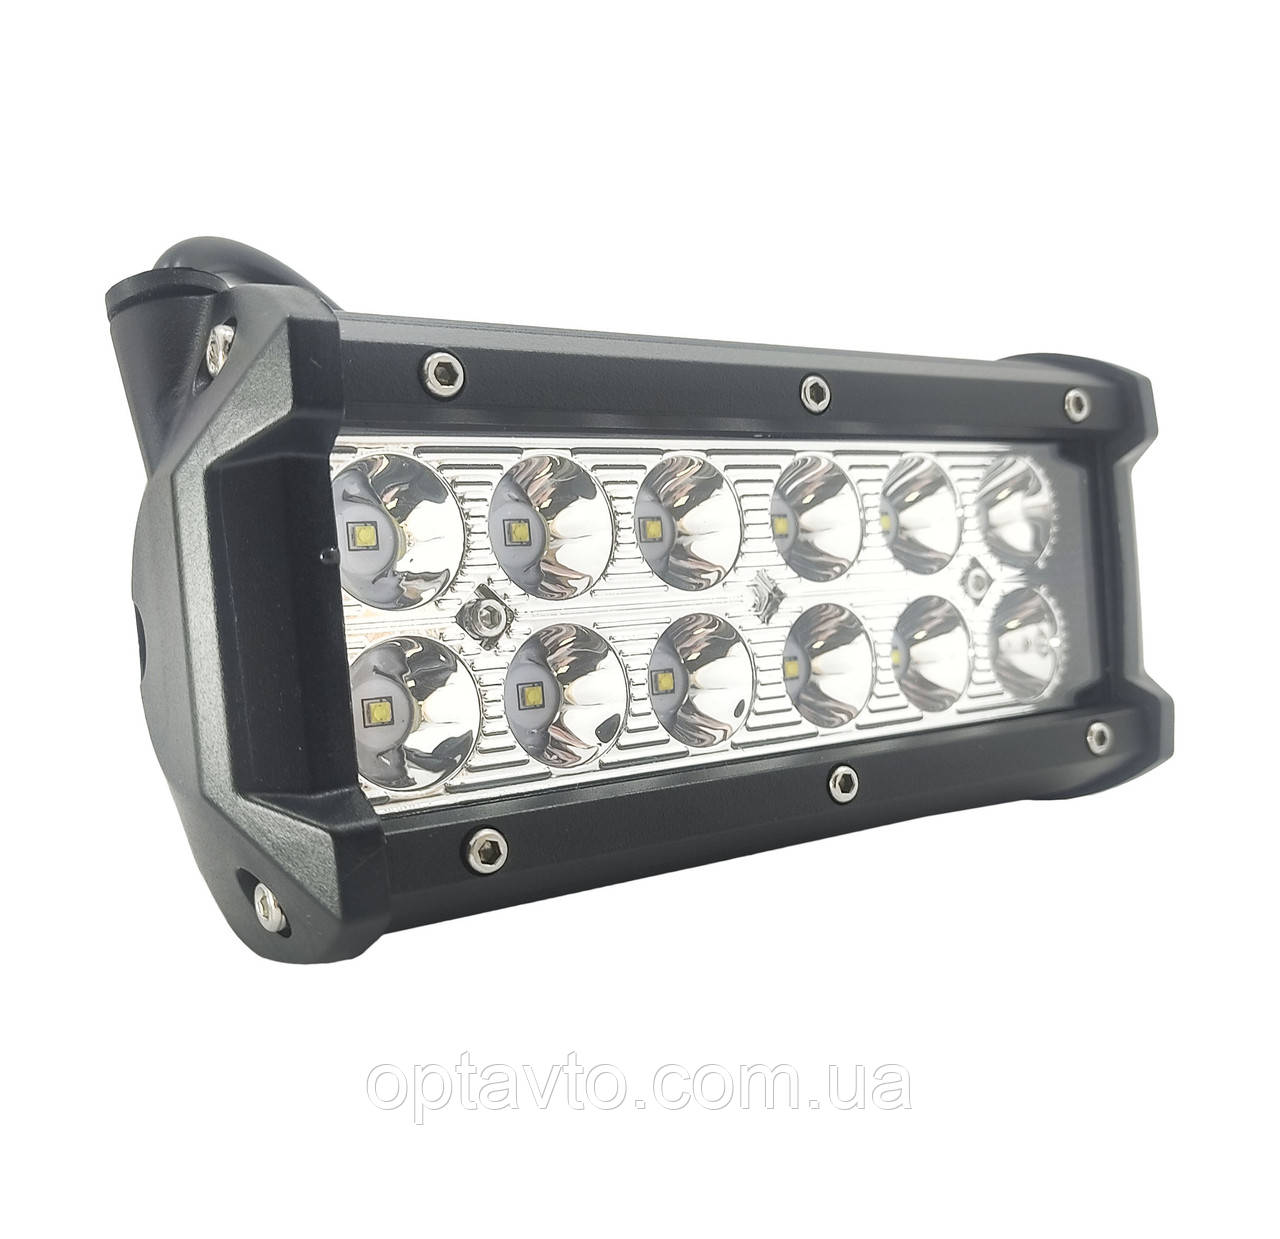 LED фара светодиодная 12 диодов. Двухрядная лэд фара - прожектор! Товар с Гарантией качества! С -36W.S. Корея